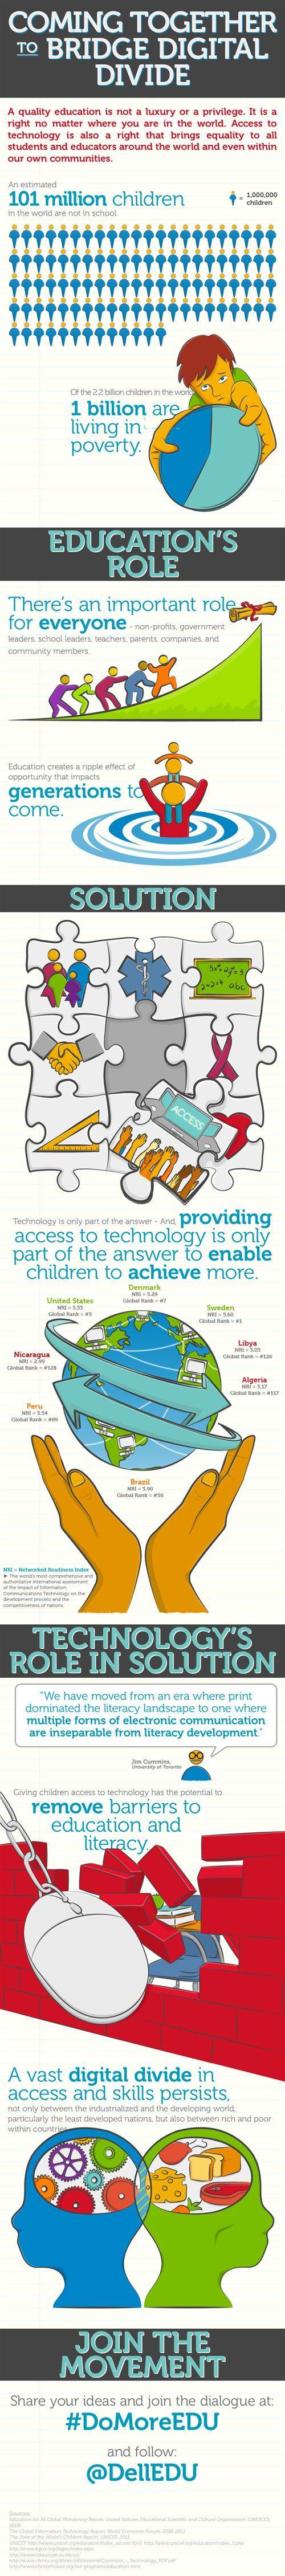 Coming together to bridge the digital divide